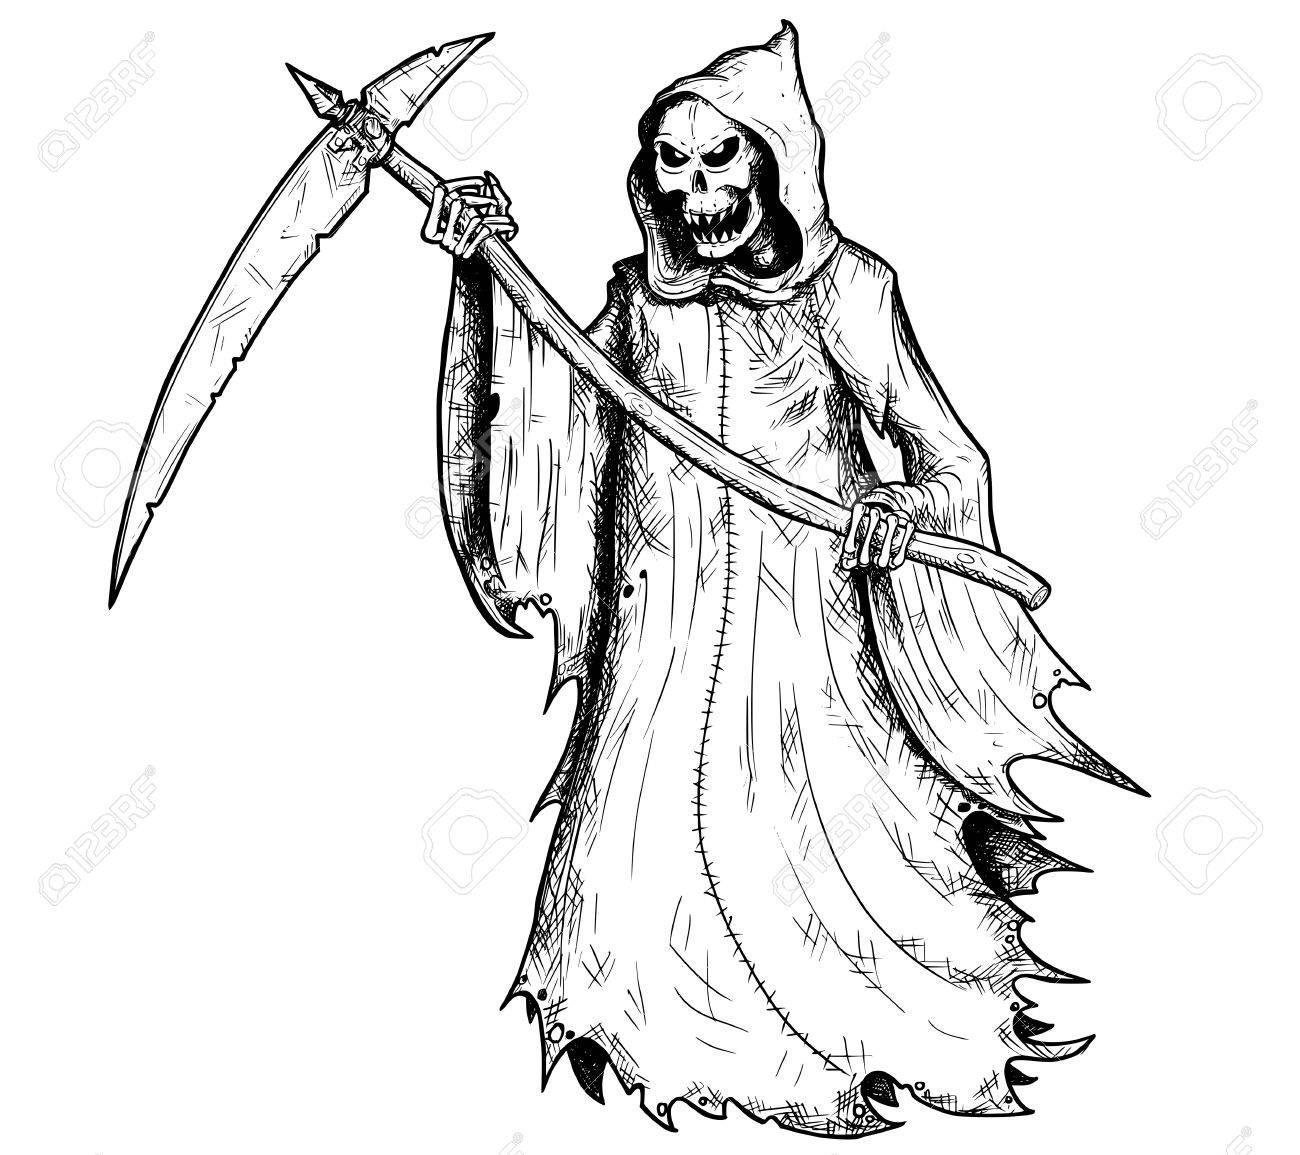 Squelette Dessin Halloween.Main Dessin Illustration Halloween Grim Reaper Squelette Humain à Faux Personnification De Mort